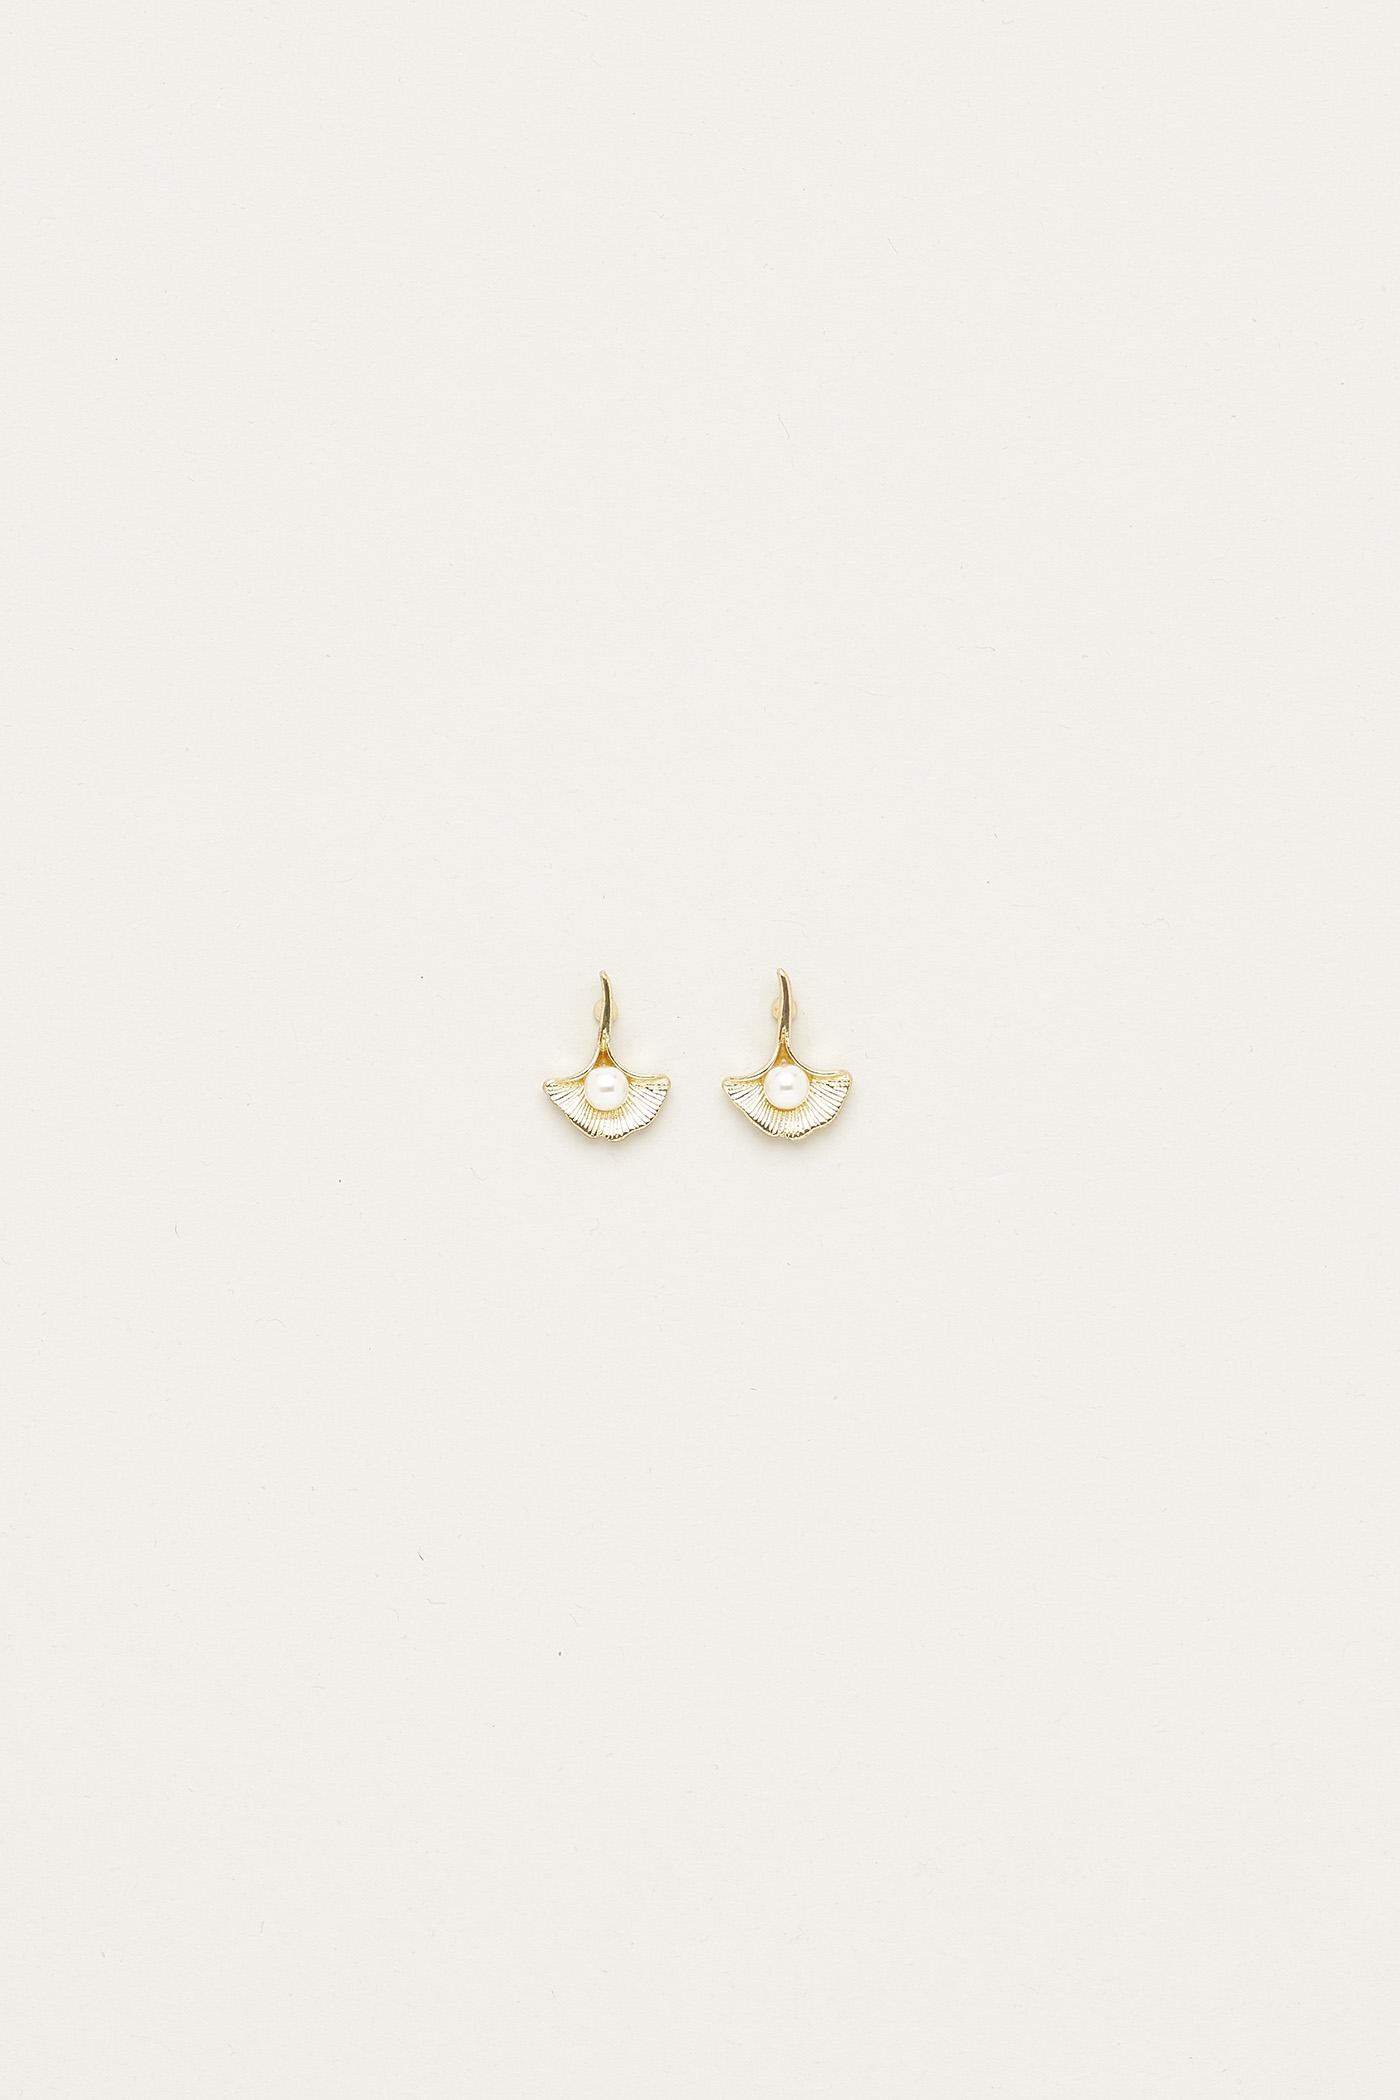 Jaymie Pearl Ear Studs